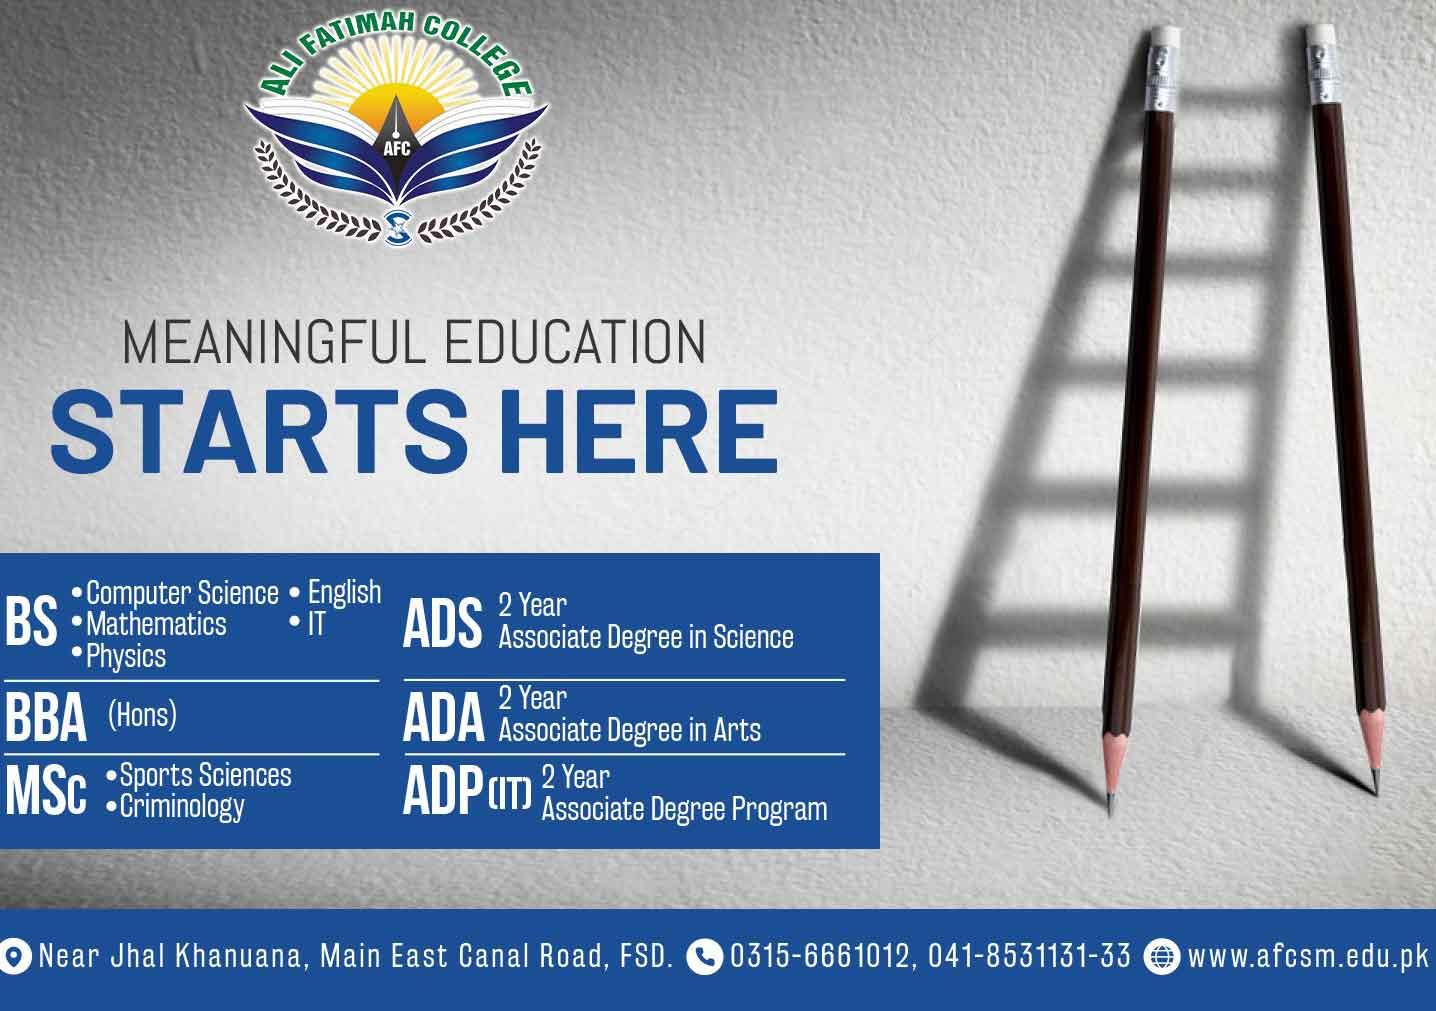 Ali-Fatimah-College-Admission-2021